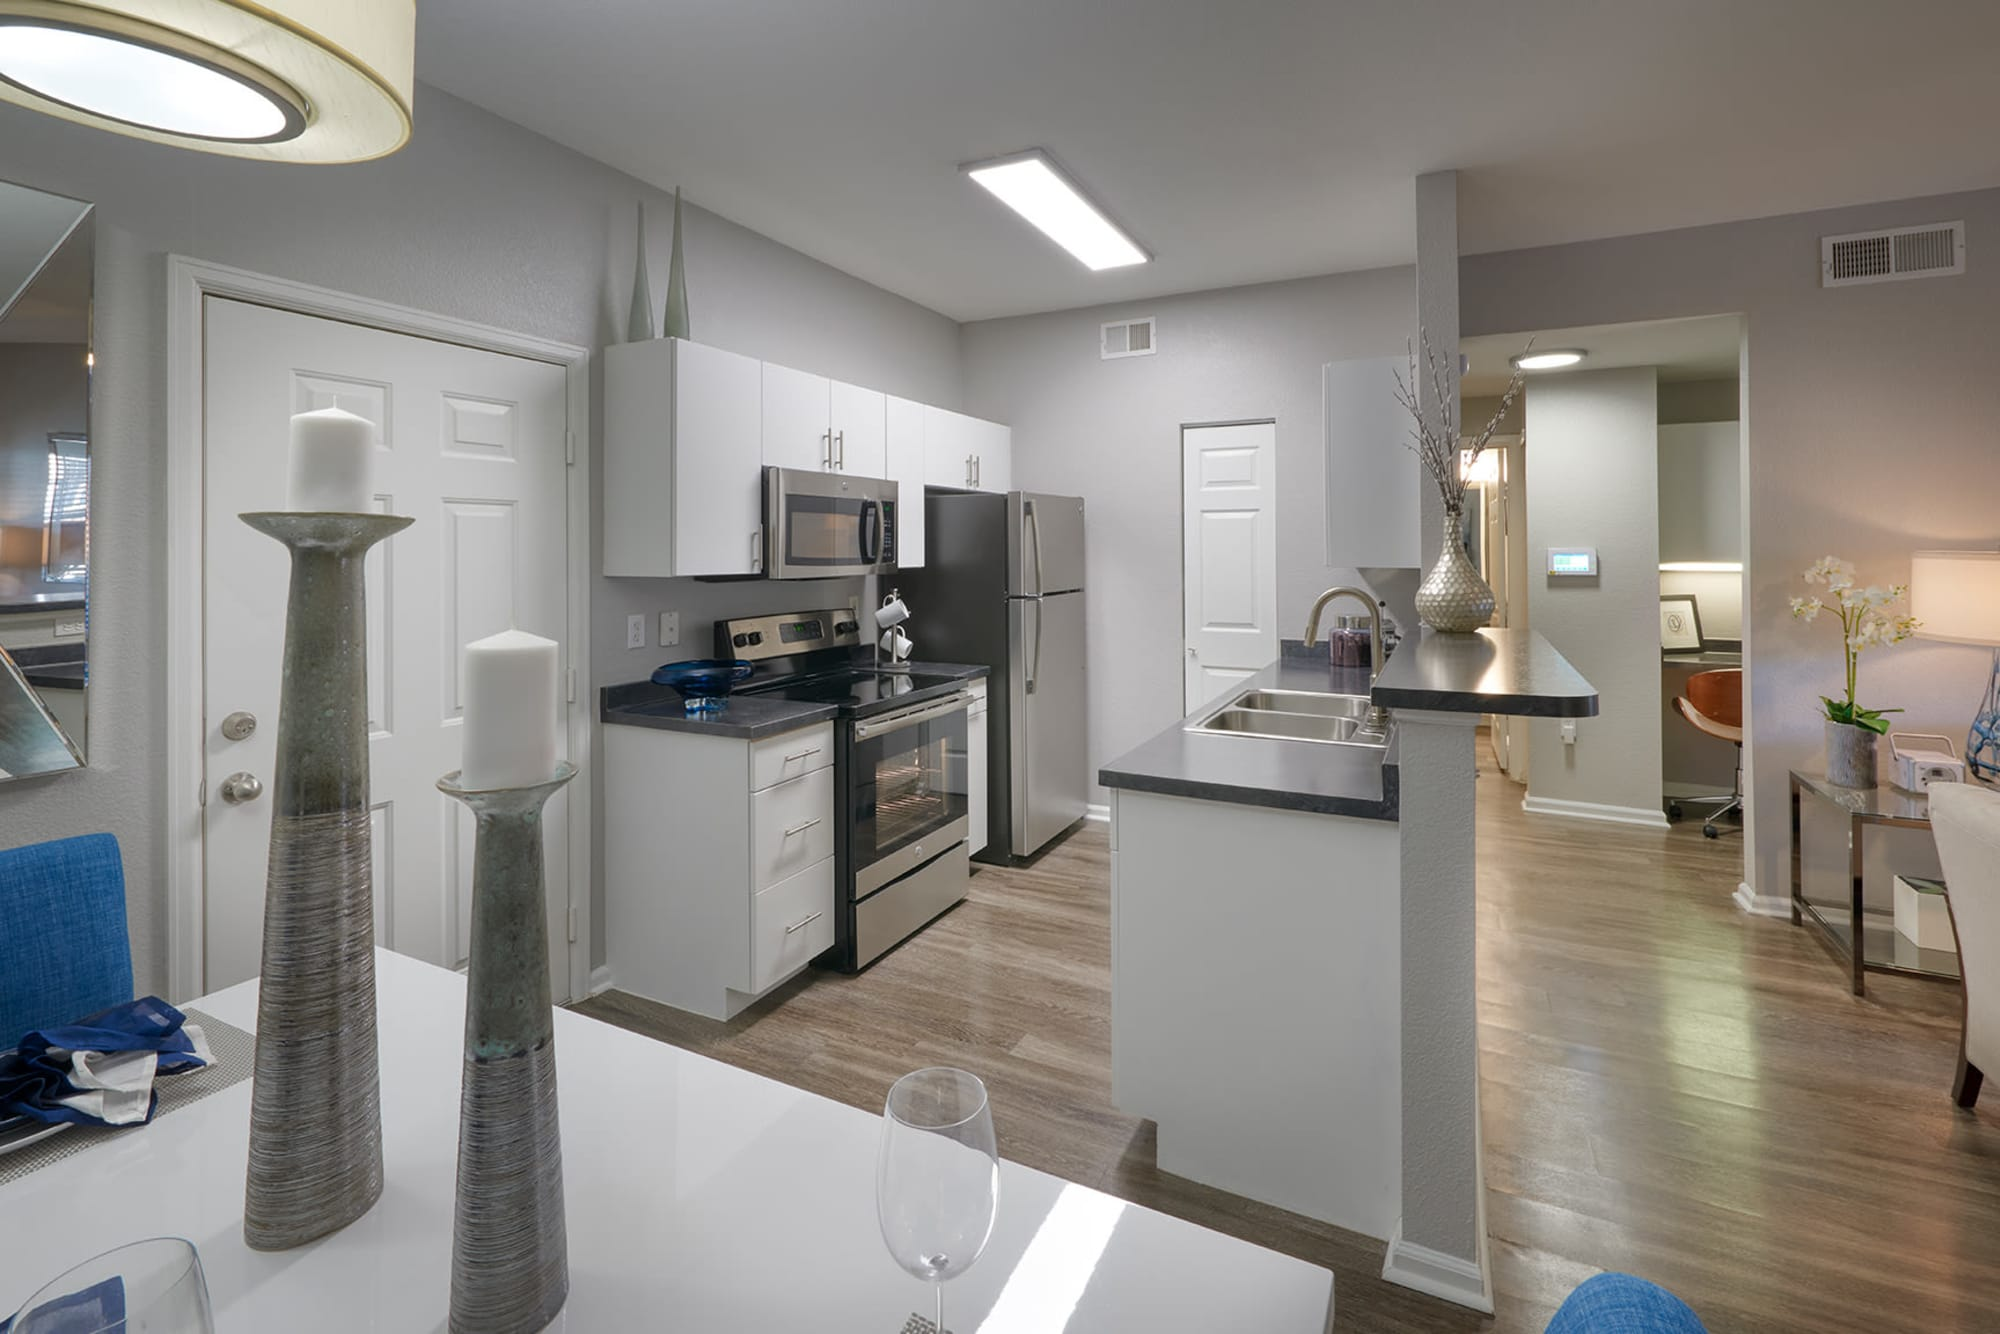 Renovated kitchen with white cabinets at Crestone Apartments in Aurora, Colorado